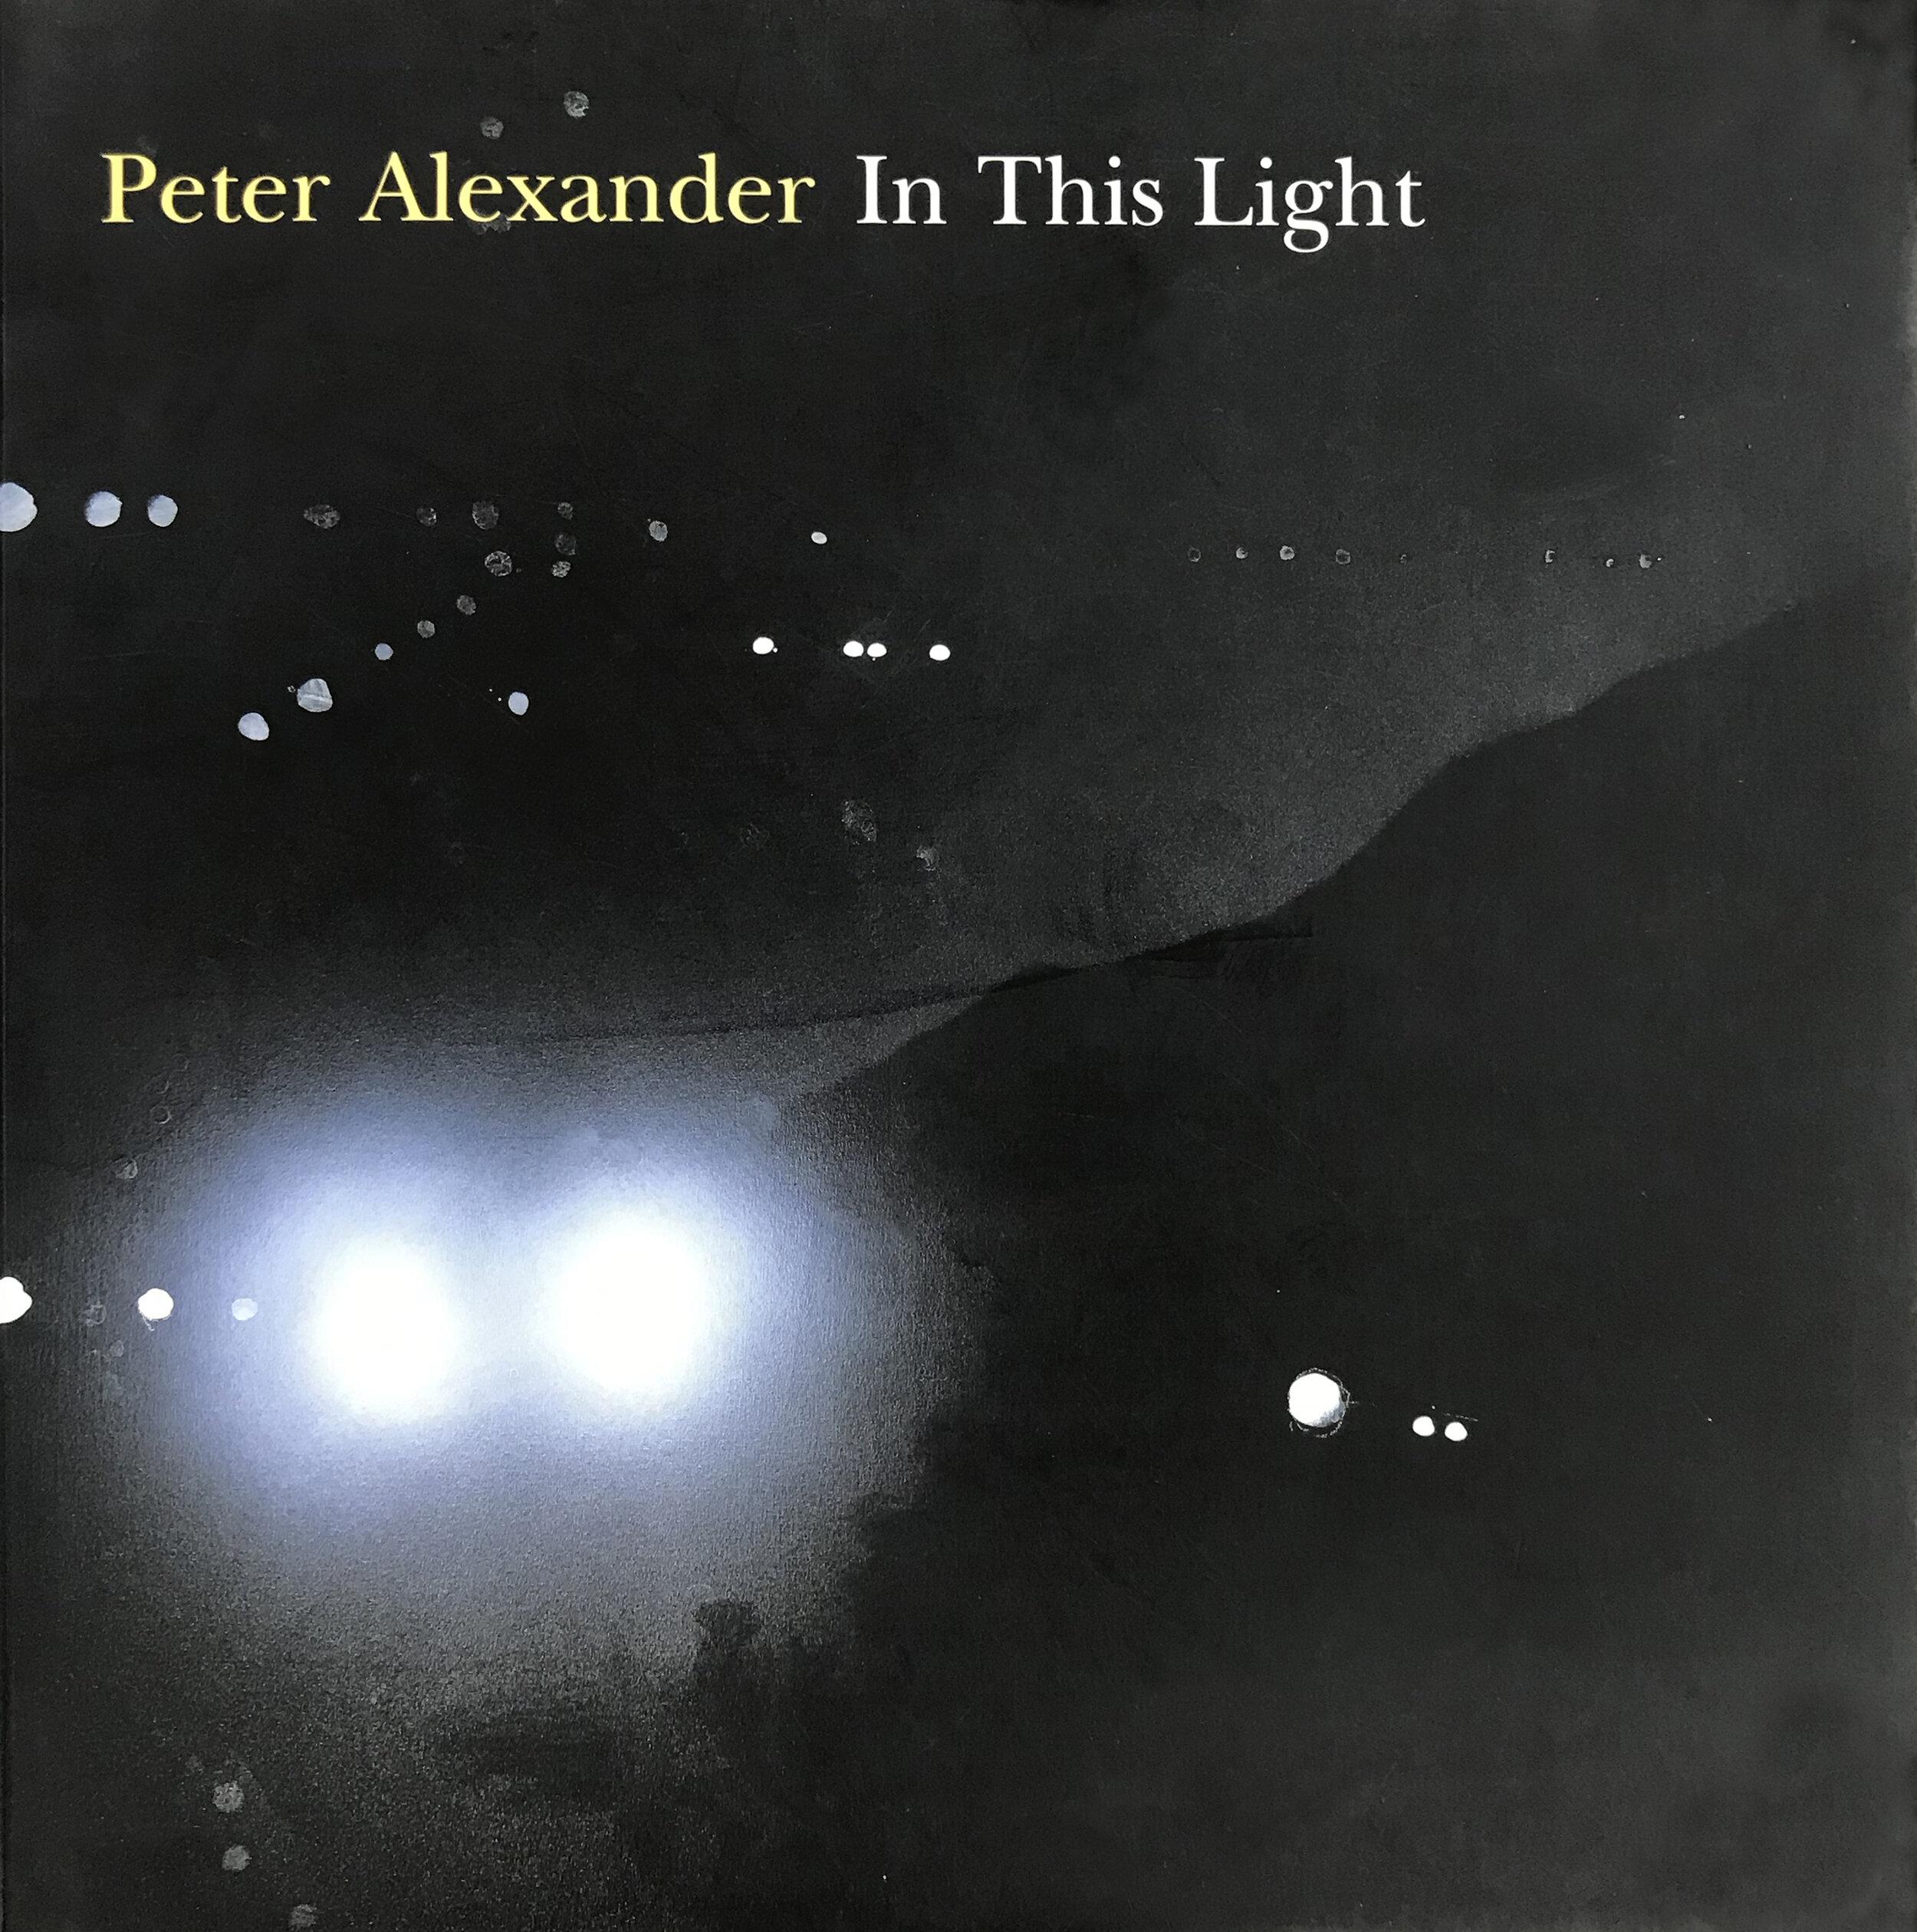 phg_PeterAlexander_InthisLight_book.jpg